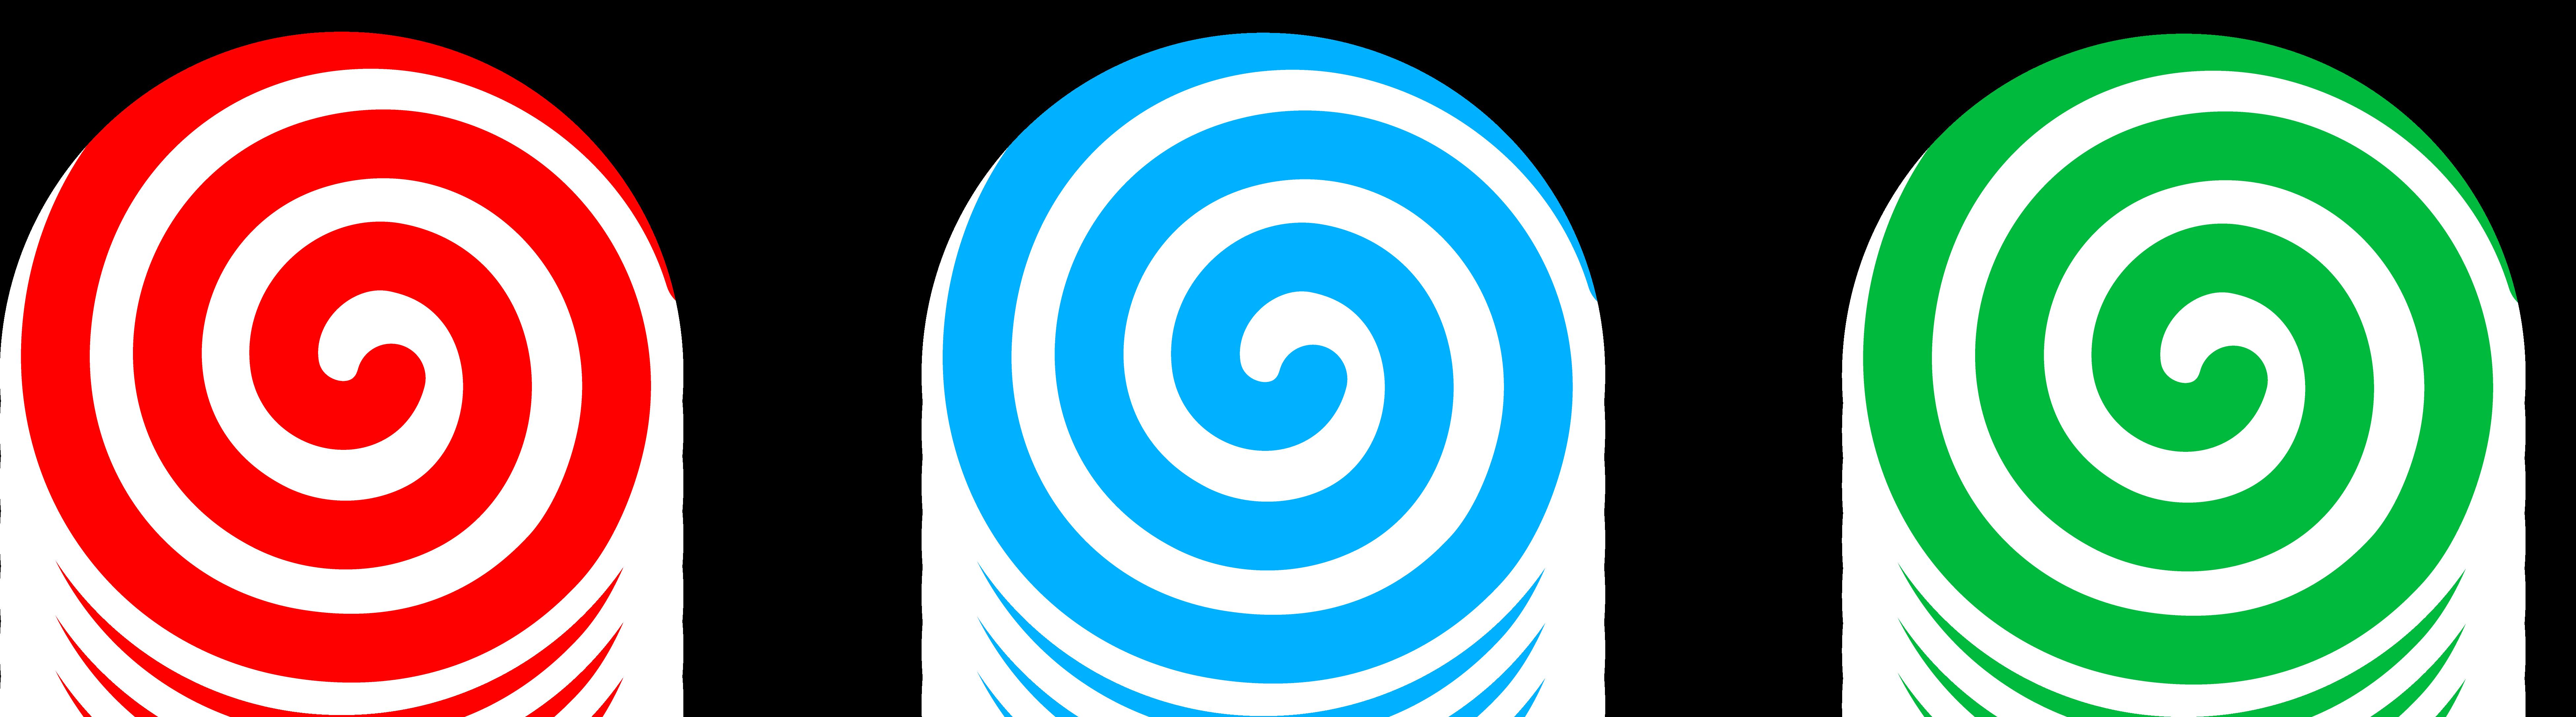 7807x2174 Spiral Candies Set Clip Art